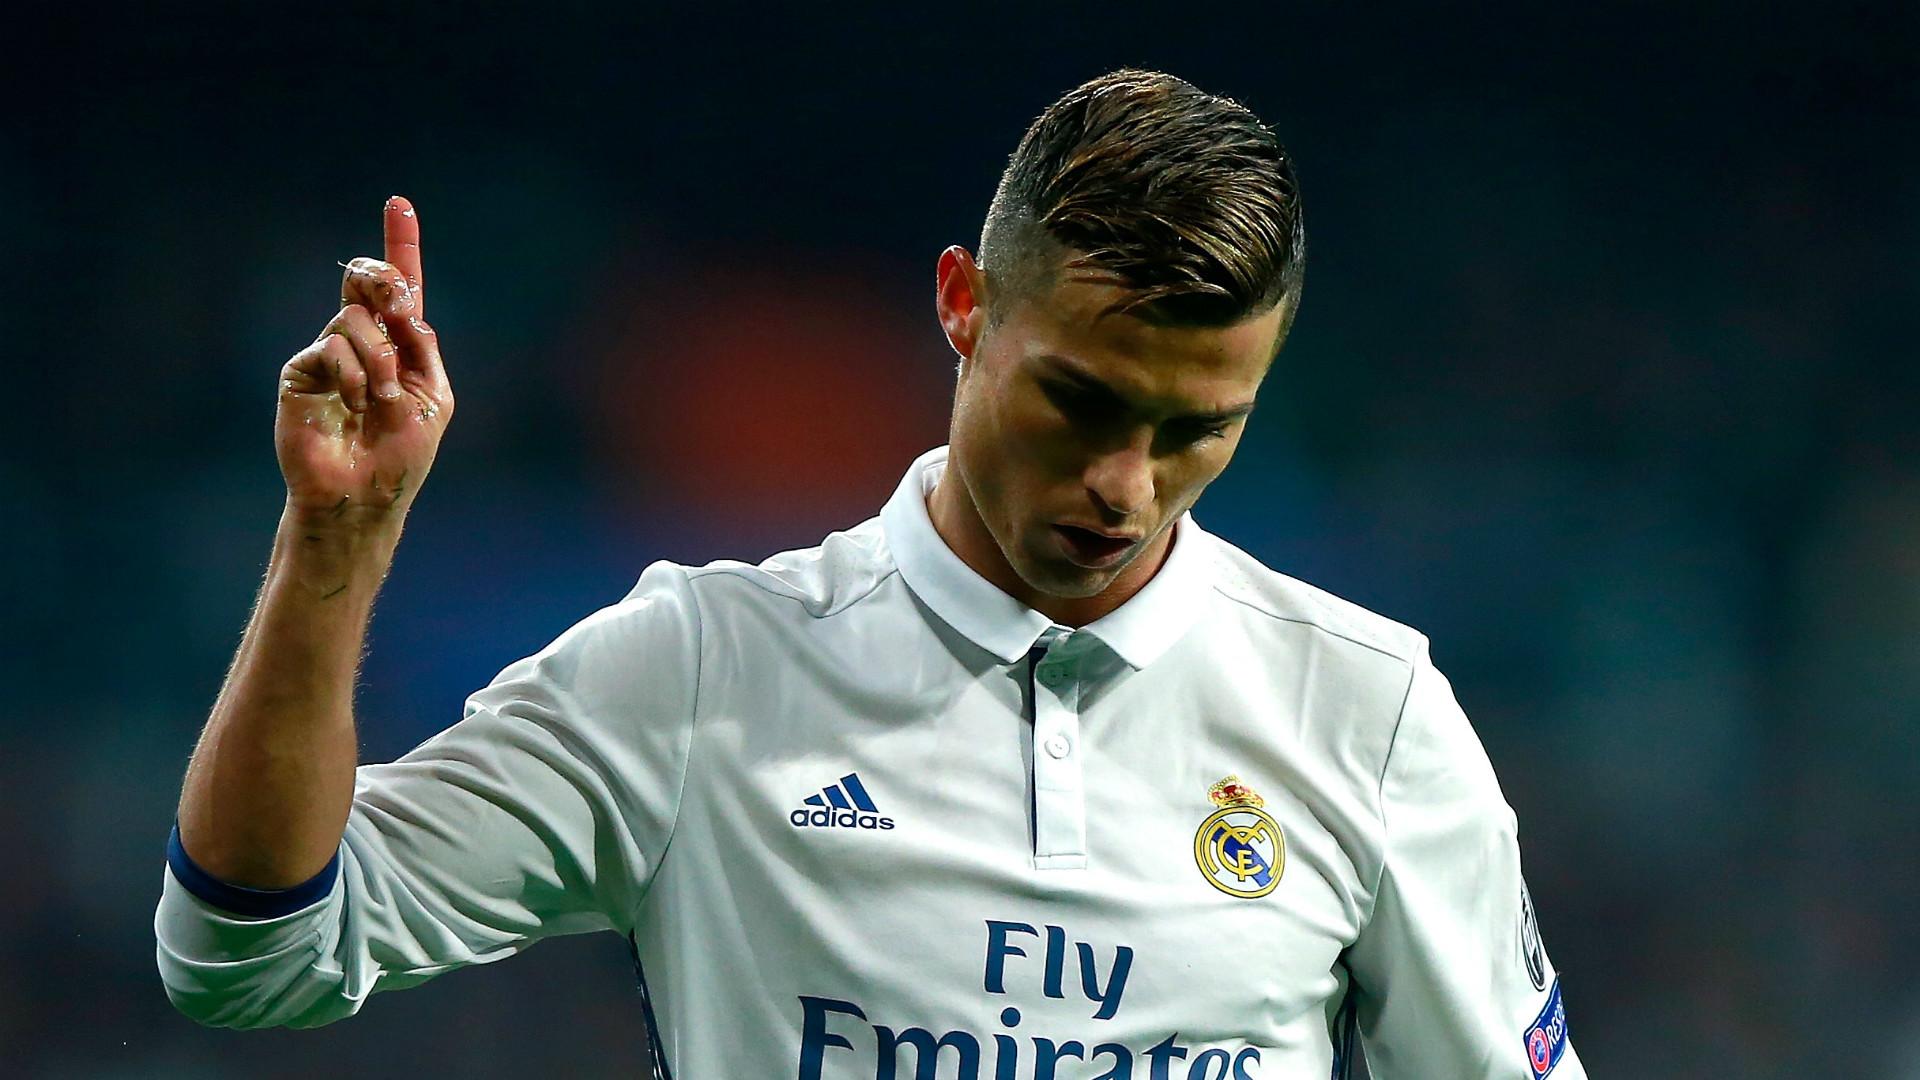 HD Cristiano Ronaldo Real Madrid